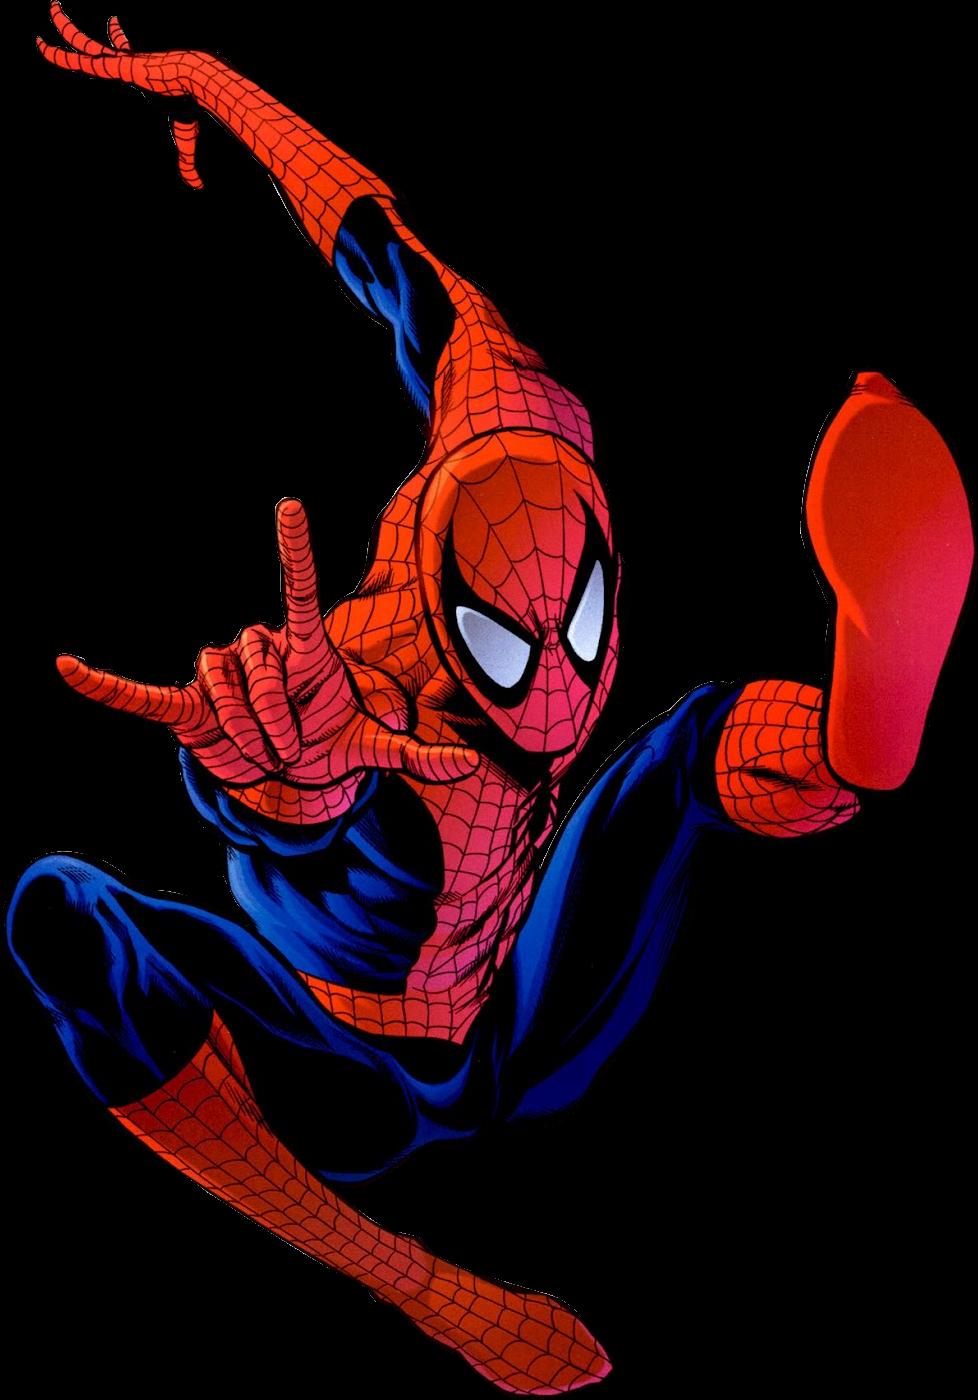 SOTW #7 [Entries] Spider_man_render_by_bobhertley-d5qlcde